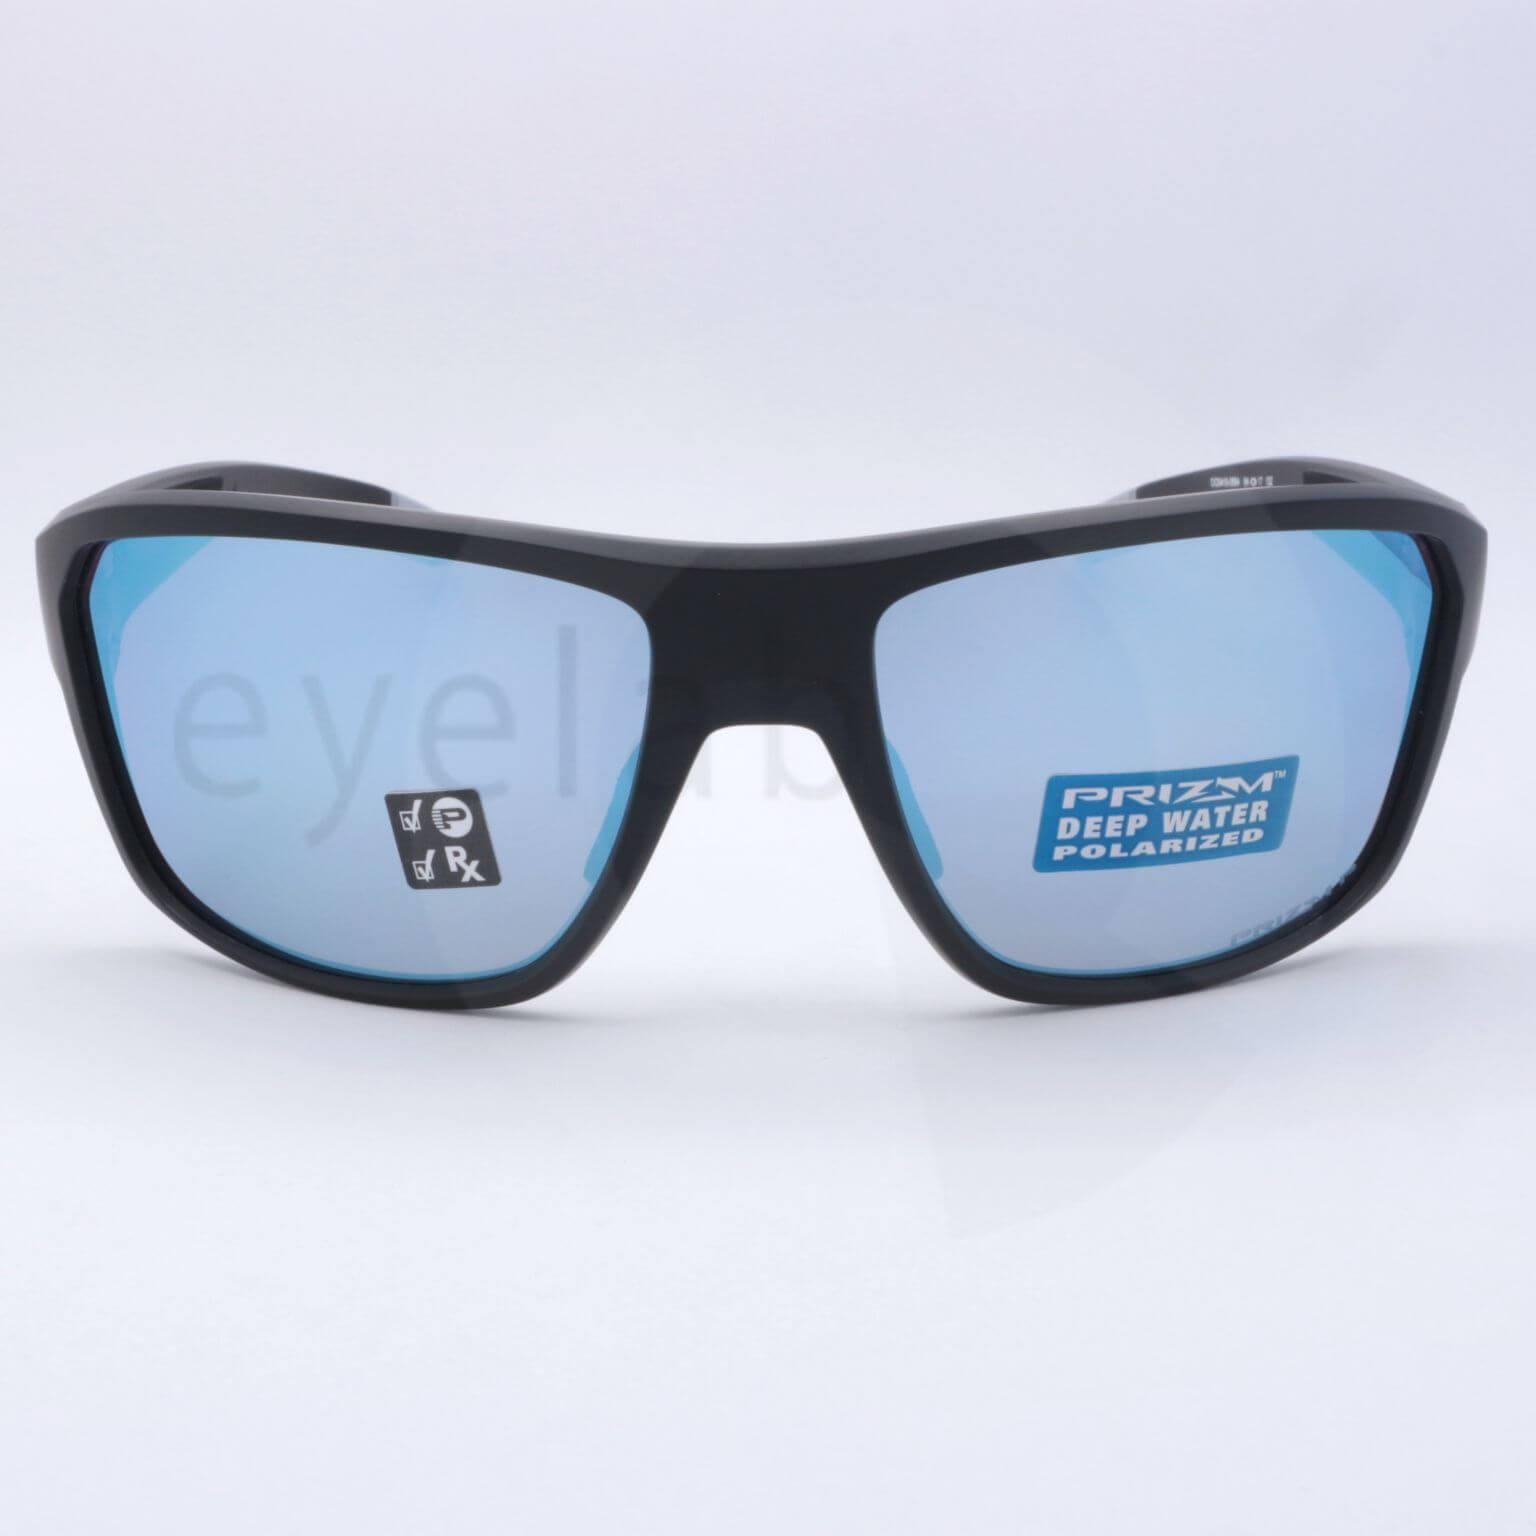 31b774fd51 Oakley 9416 Split Shot 06 sunglasses ~ Οπτικά Eyelab